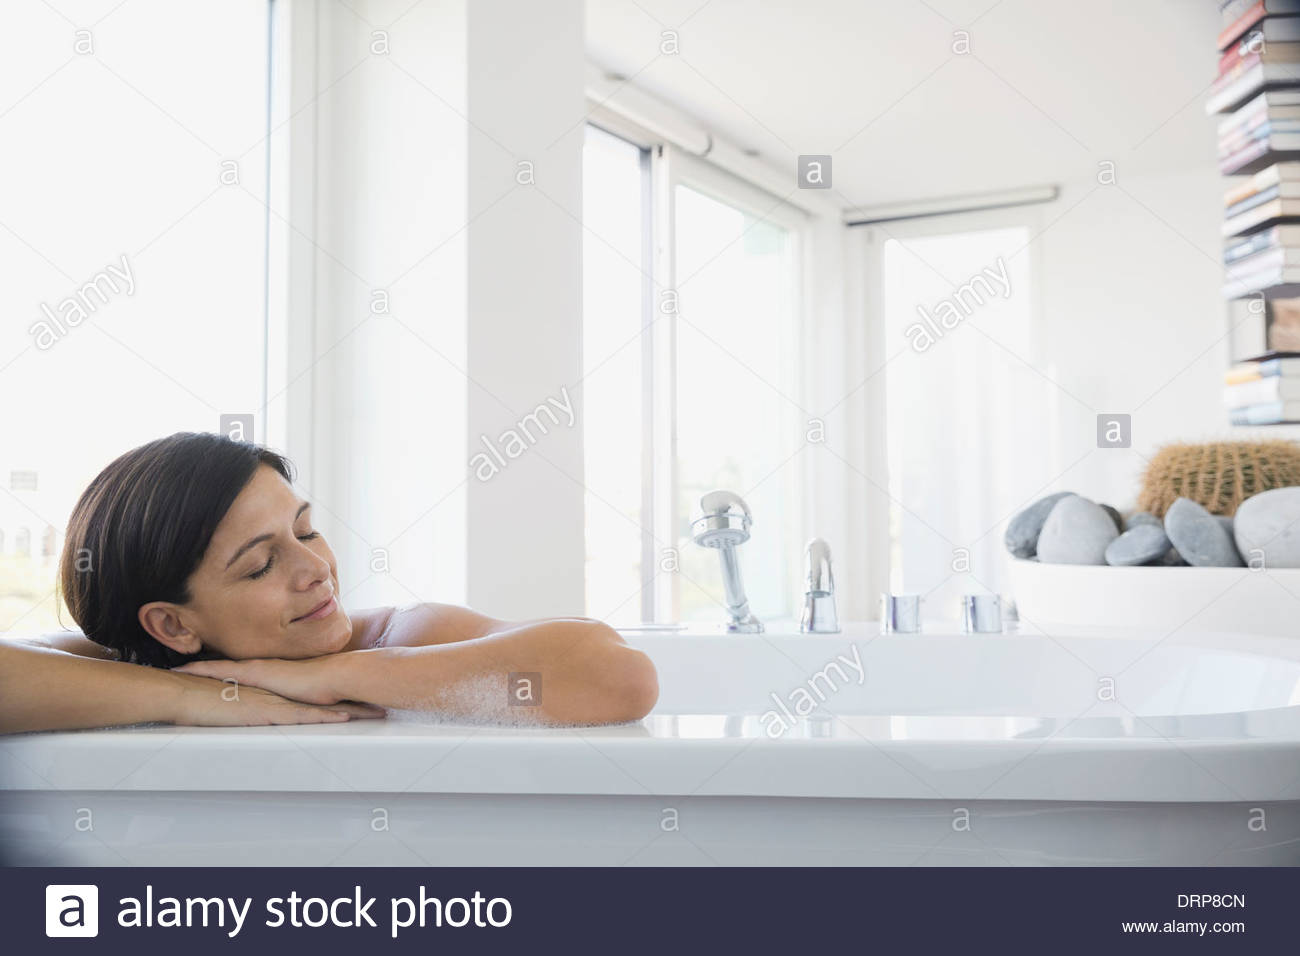 Frau genießt Schaumbad Stockbild